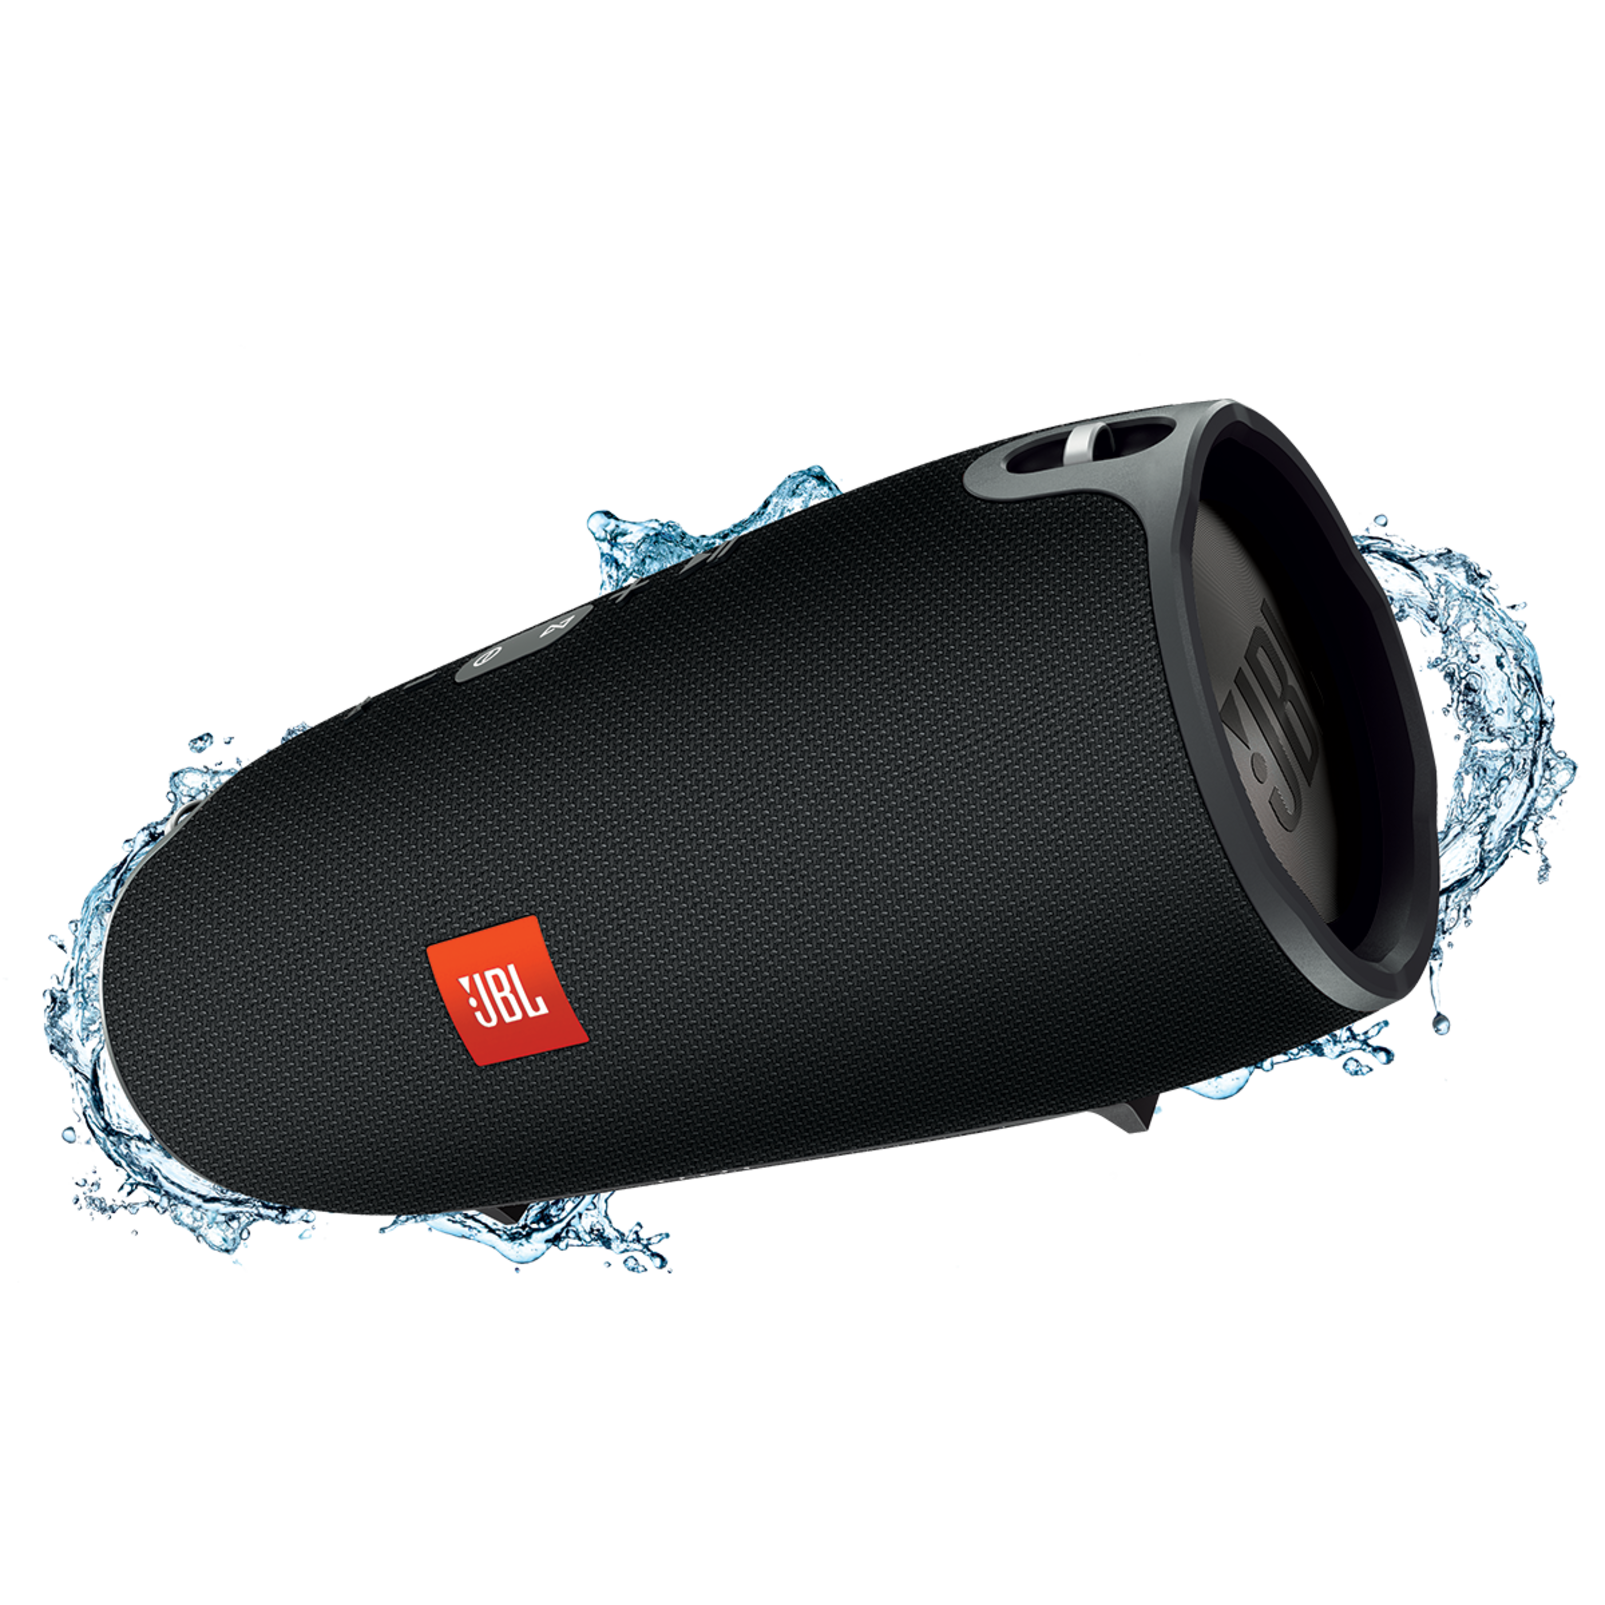 JBL Xtreme - Black - Splashproof portable speaker with ultra-powerful performance - Hero